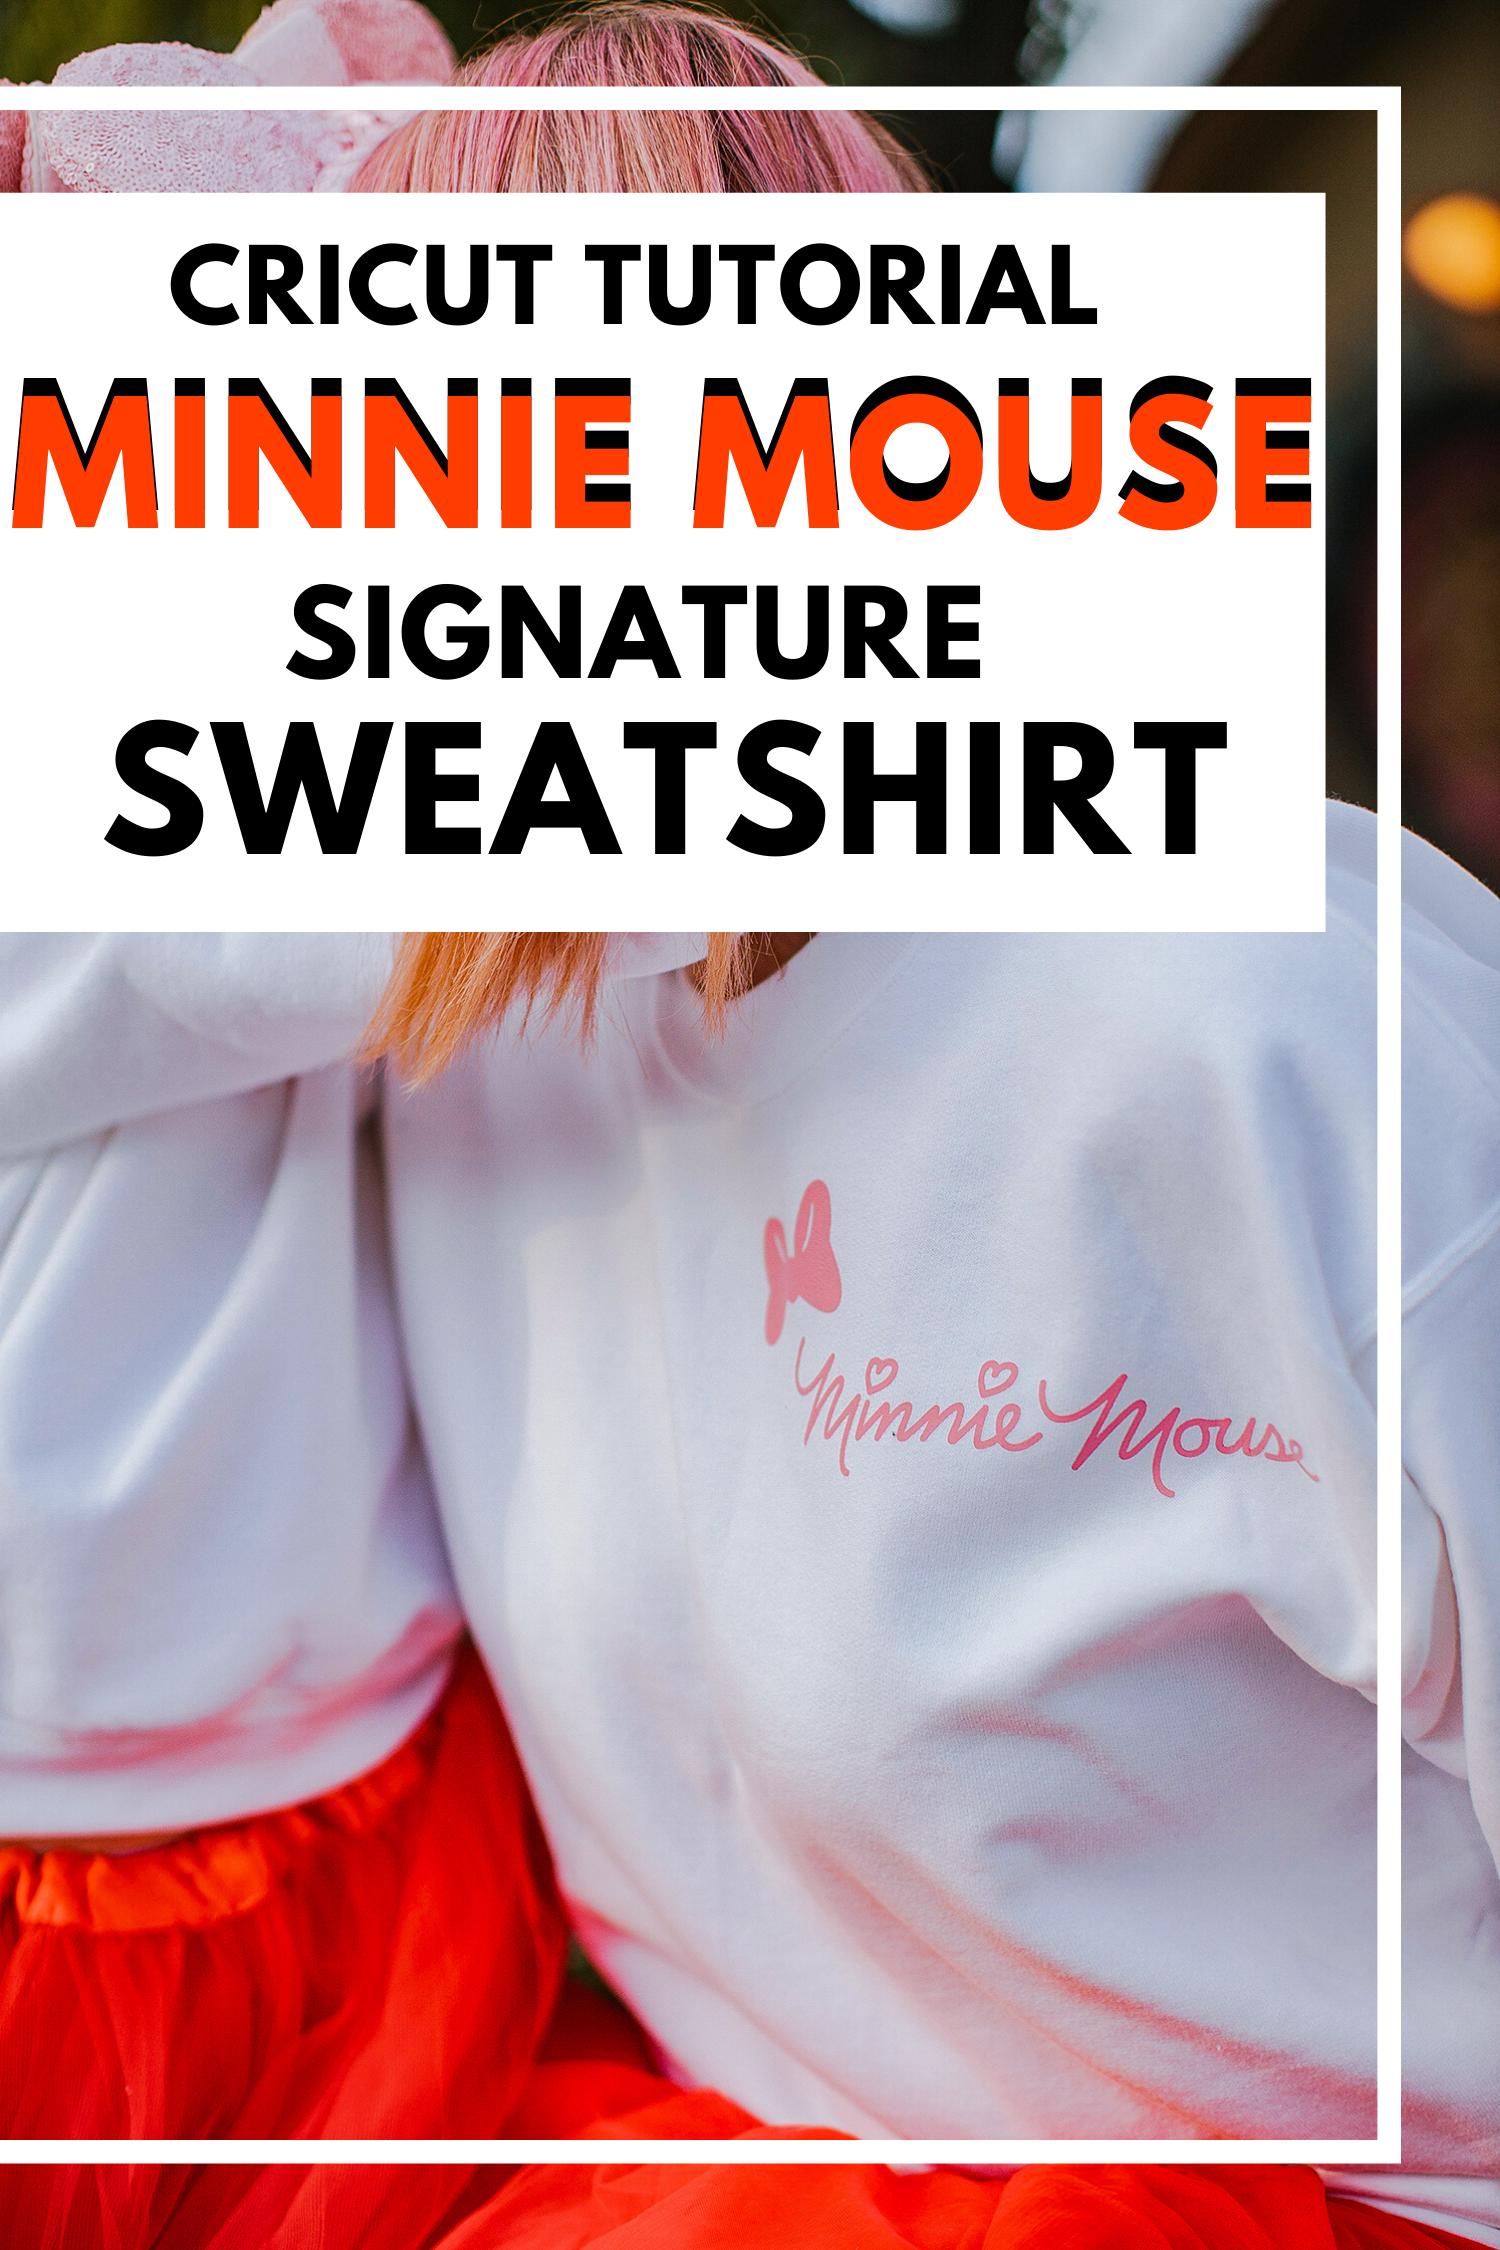 On the hunt for Disneyland Outfits? This DIY Minnie Mouse Sweatshirt is a super easy Cricut Tutorial. #cricutdisneyshirt #disneyshirt